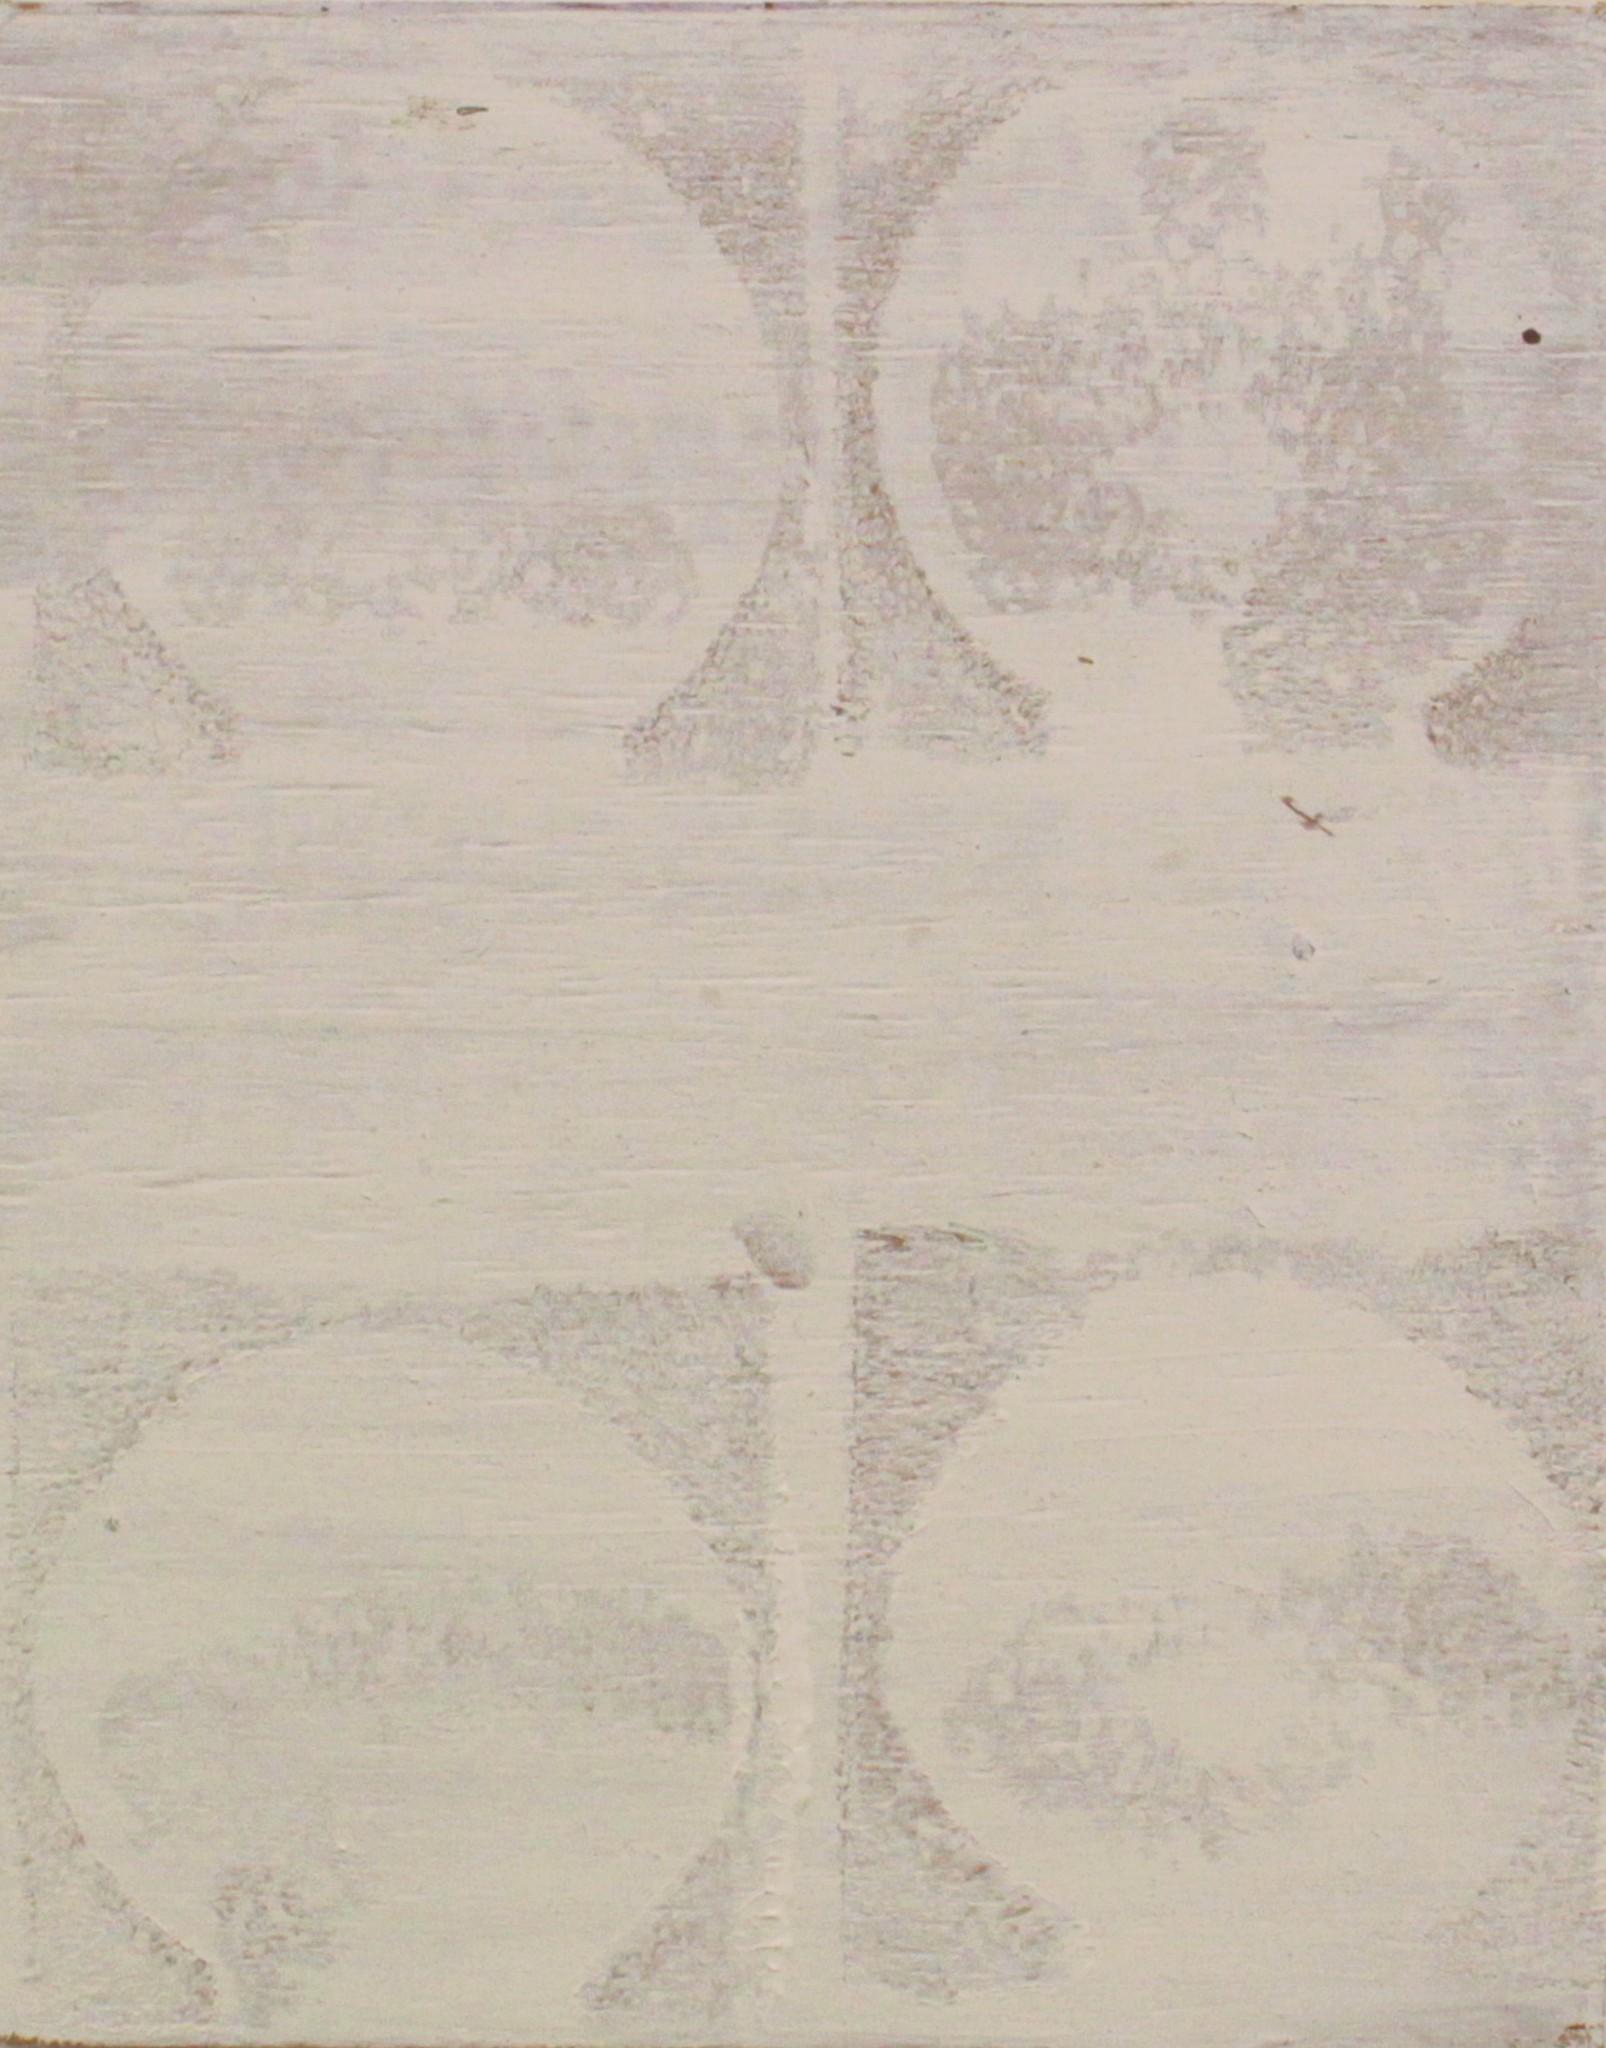 Utan titel, olja på pannå, 24 x 19 cm, 2018